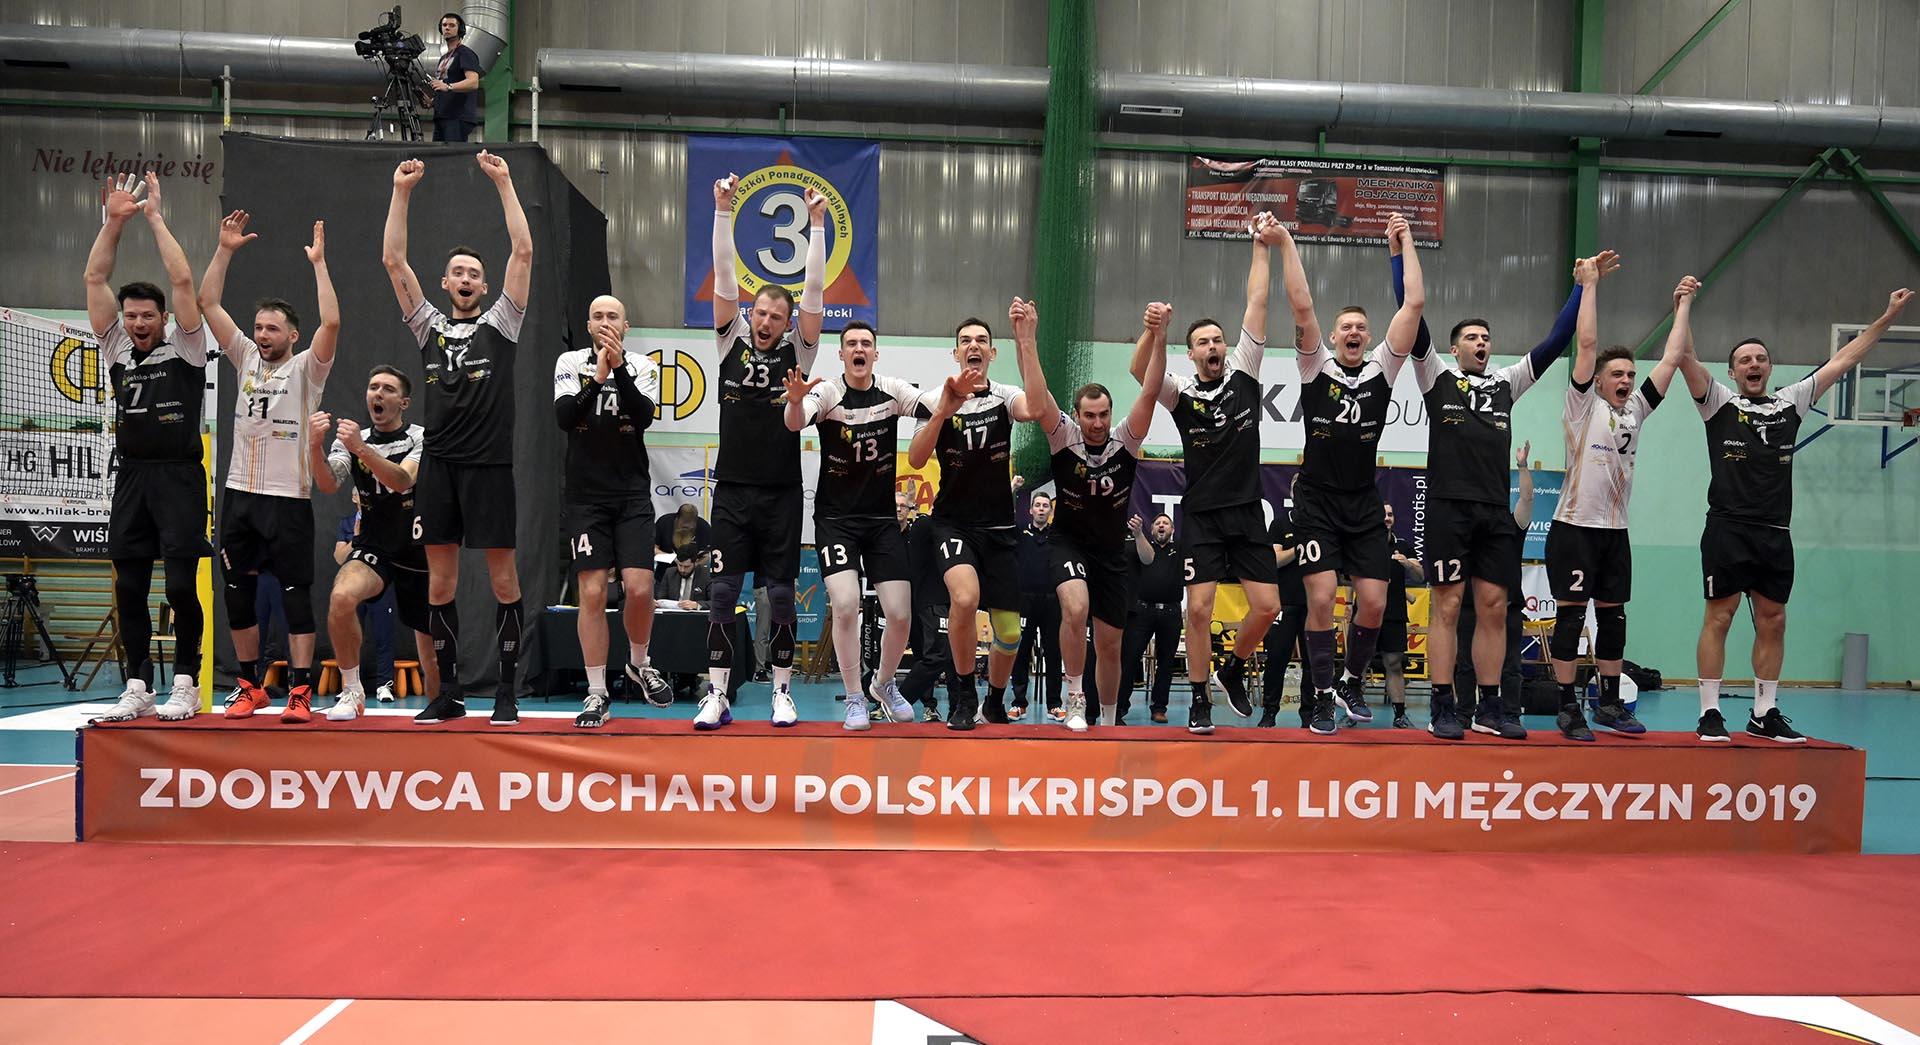 krispol-1-liga-podsumowuje-sezon-i-podaje-statystyki-3